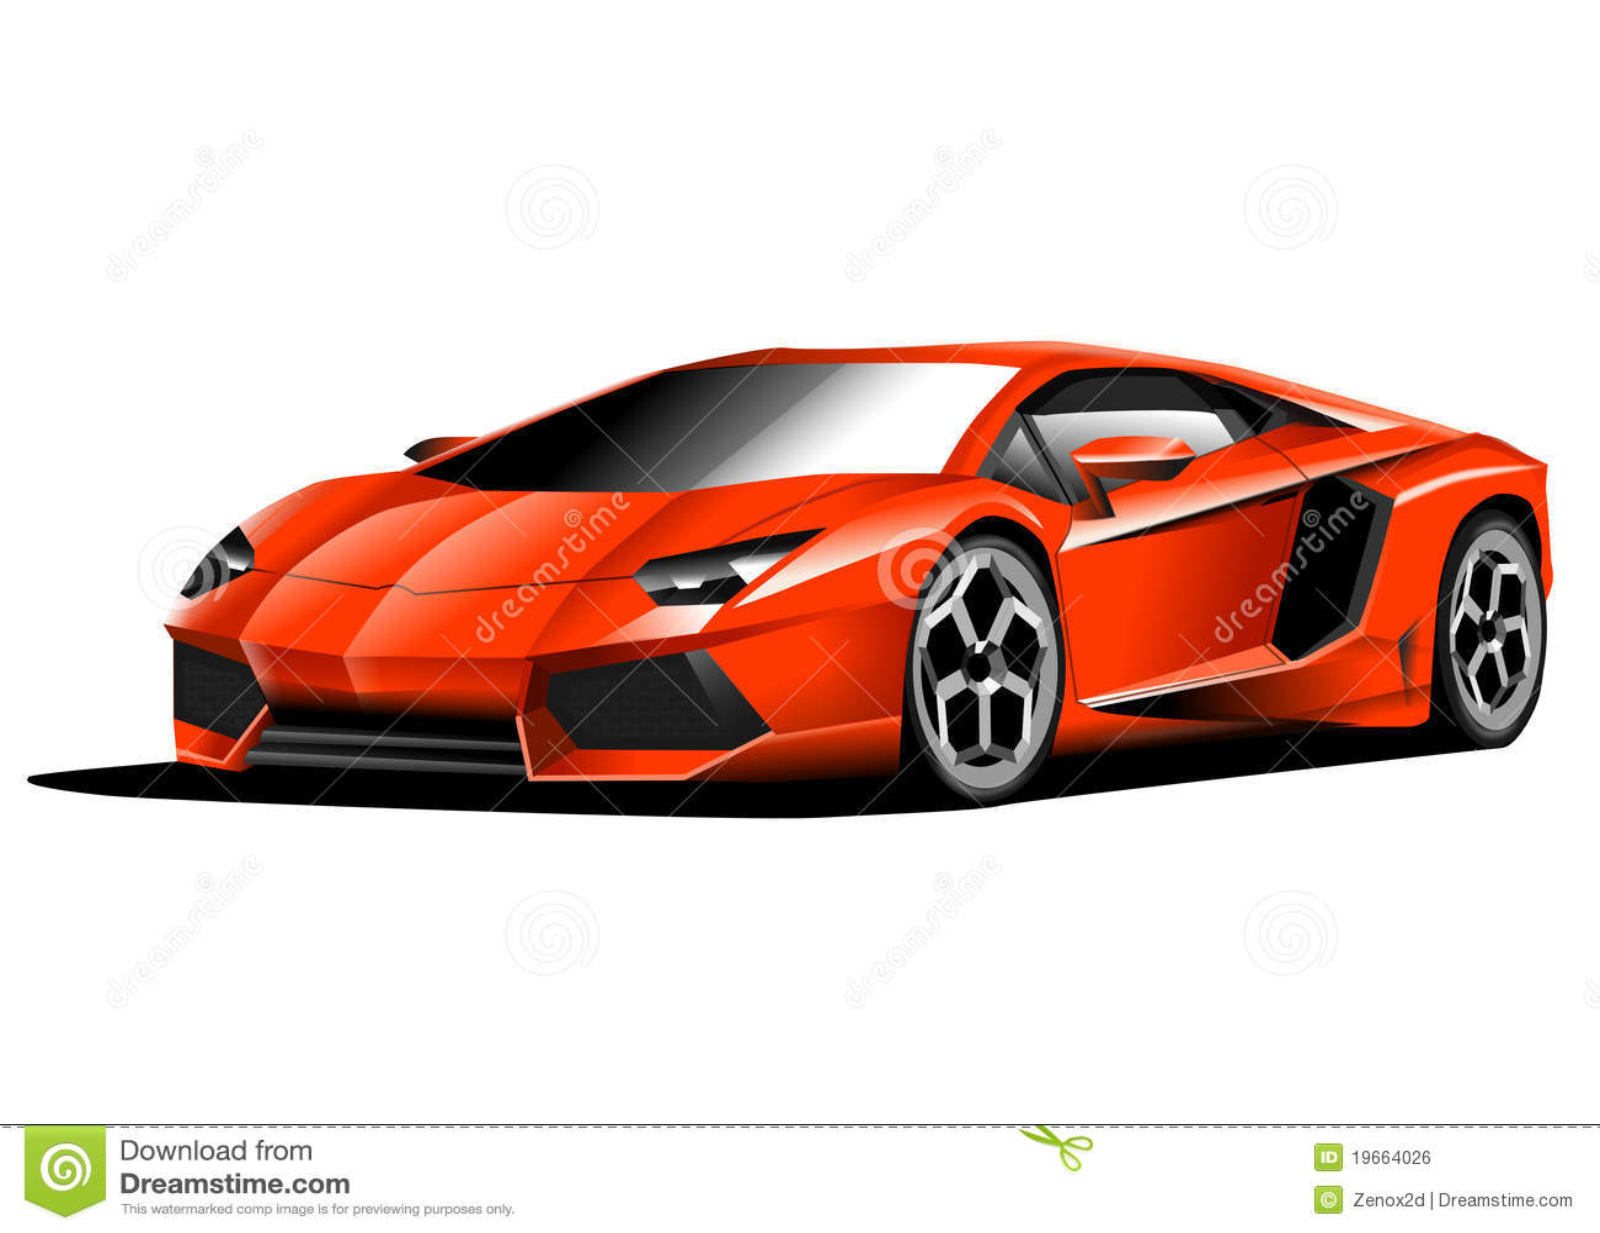 Clip Art Cars Racing